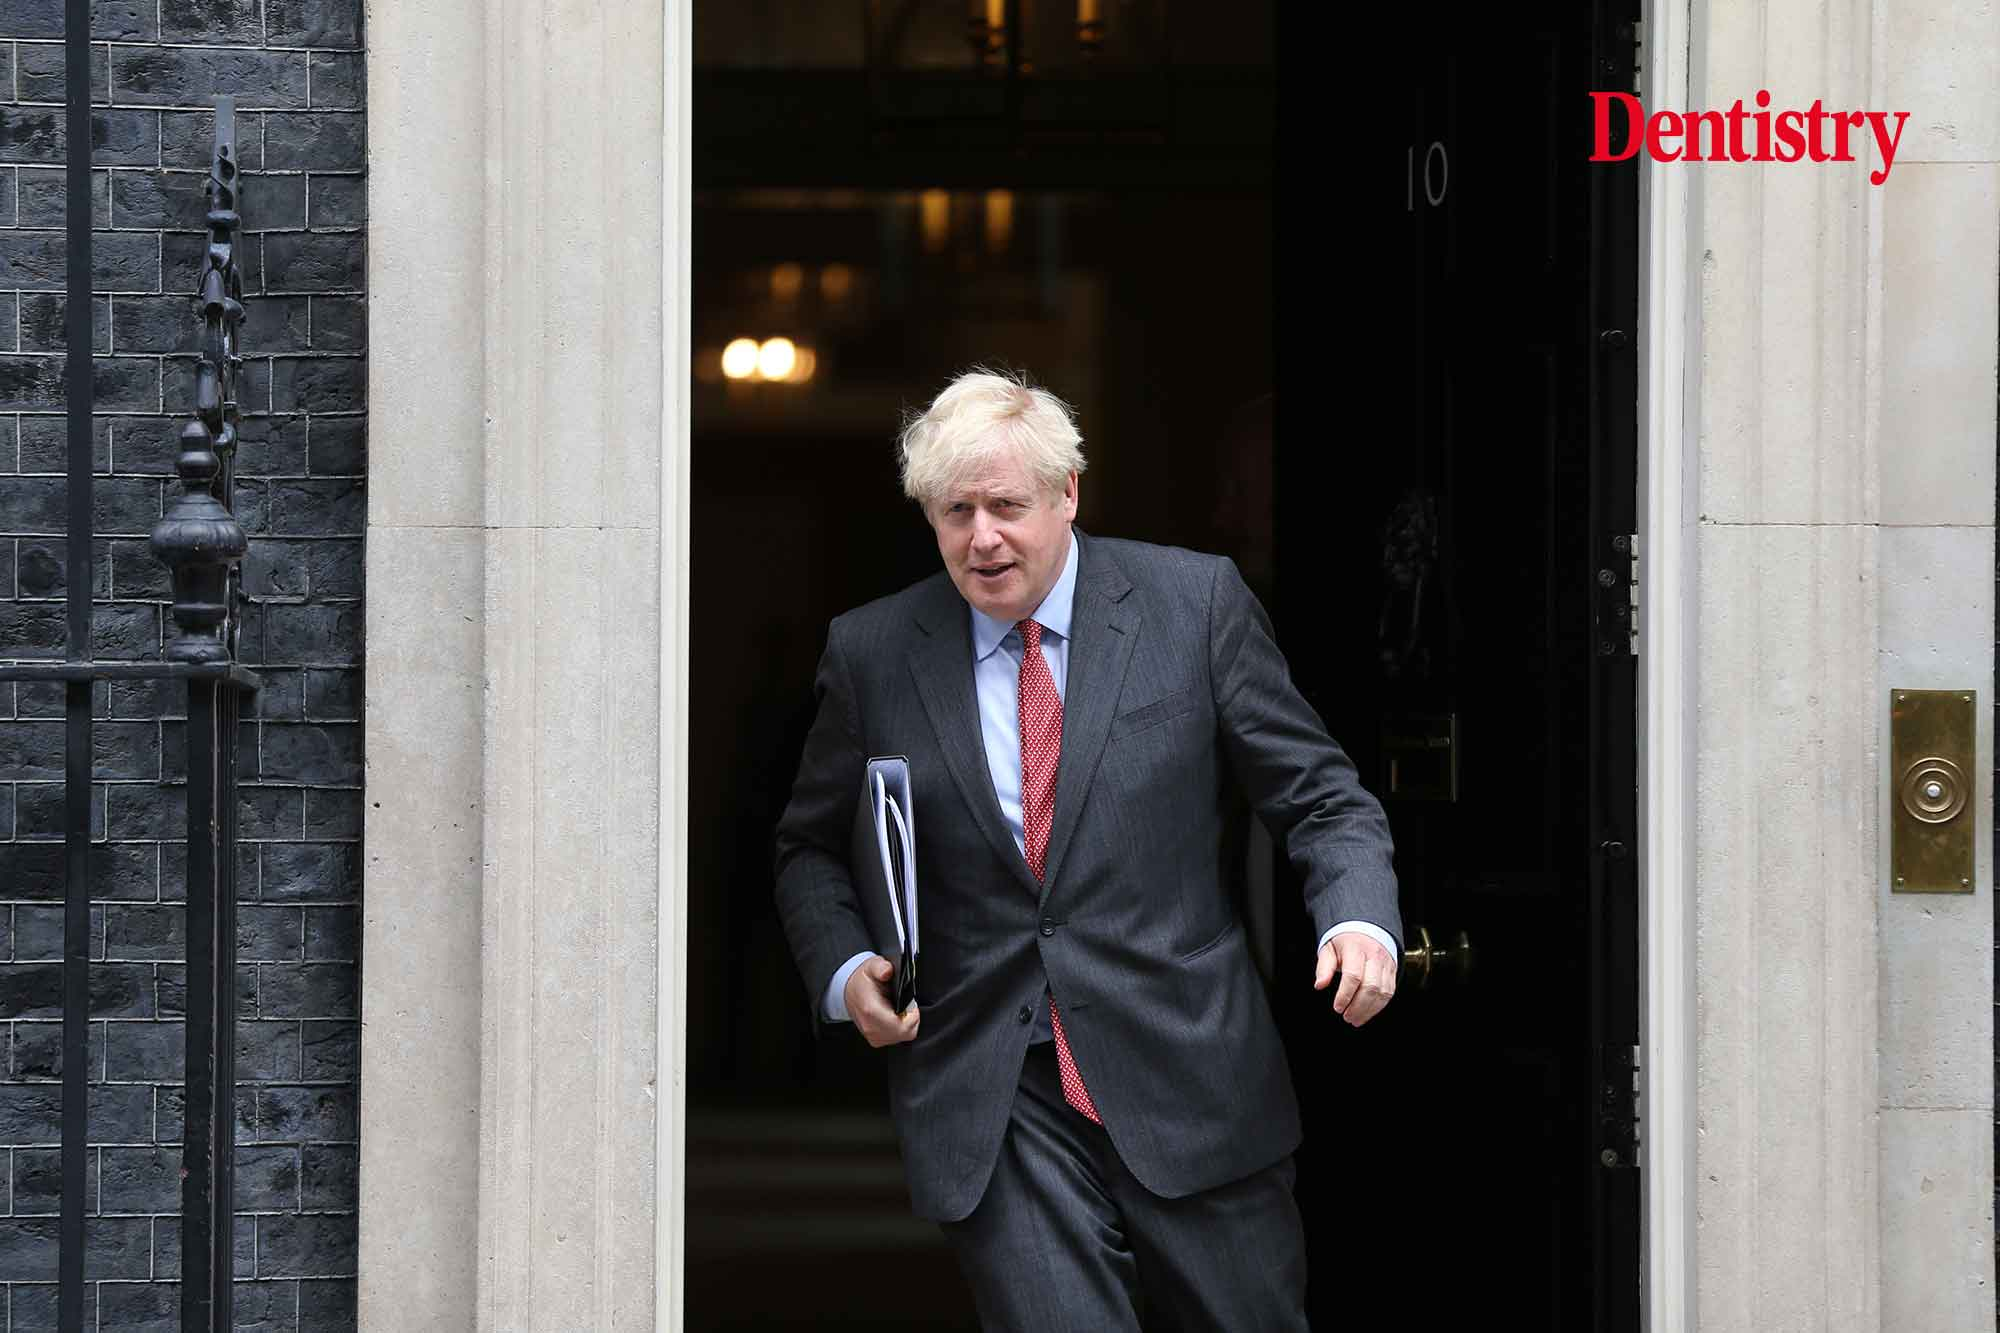 Boris Johnson discusses NHS dentistry